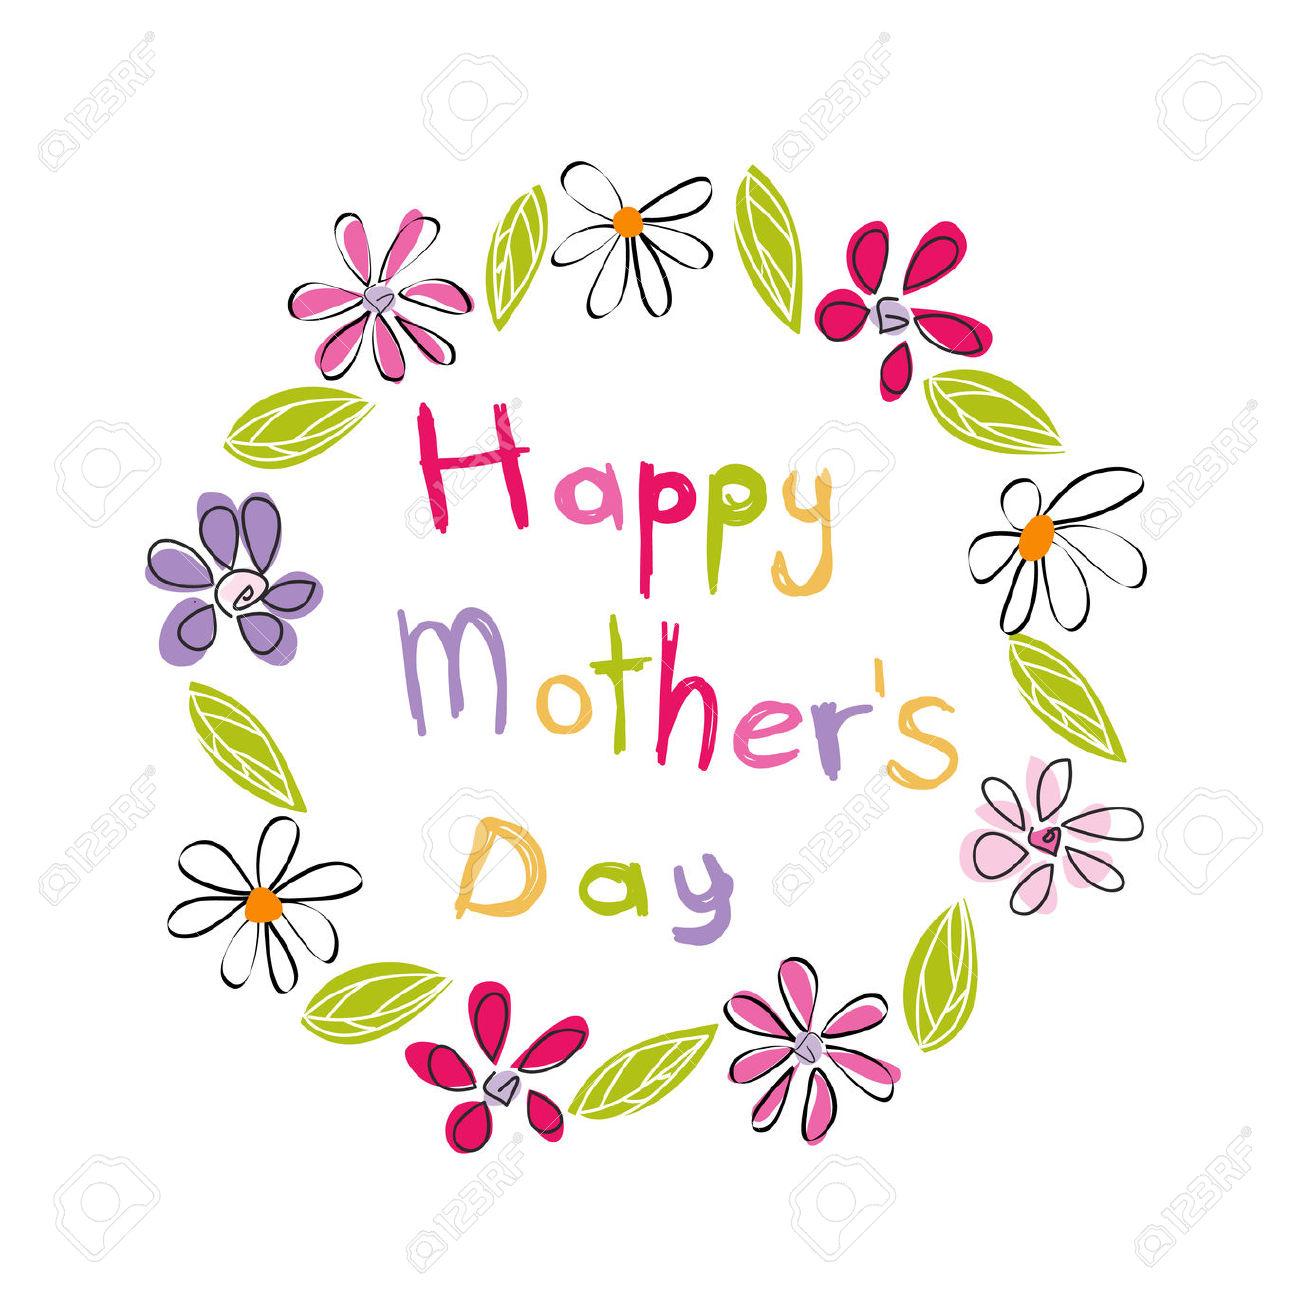 feliz dia de las madres clipart #11